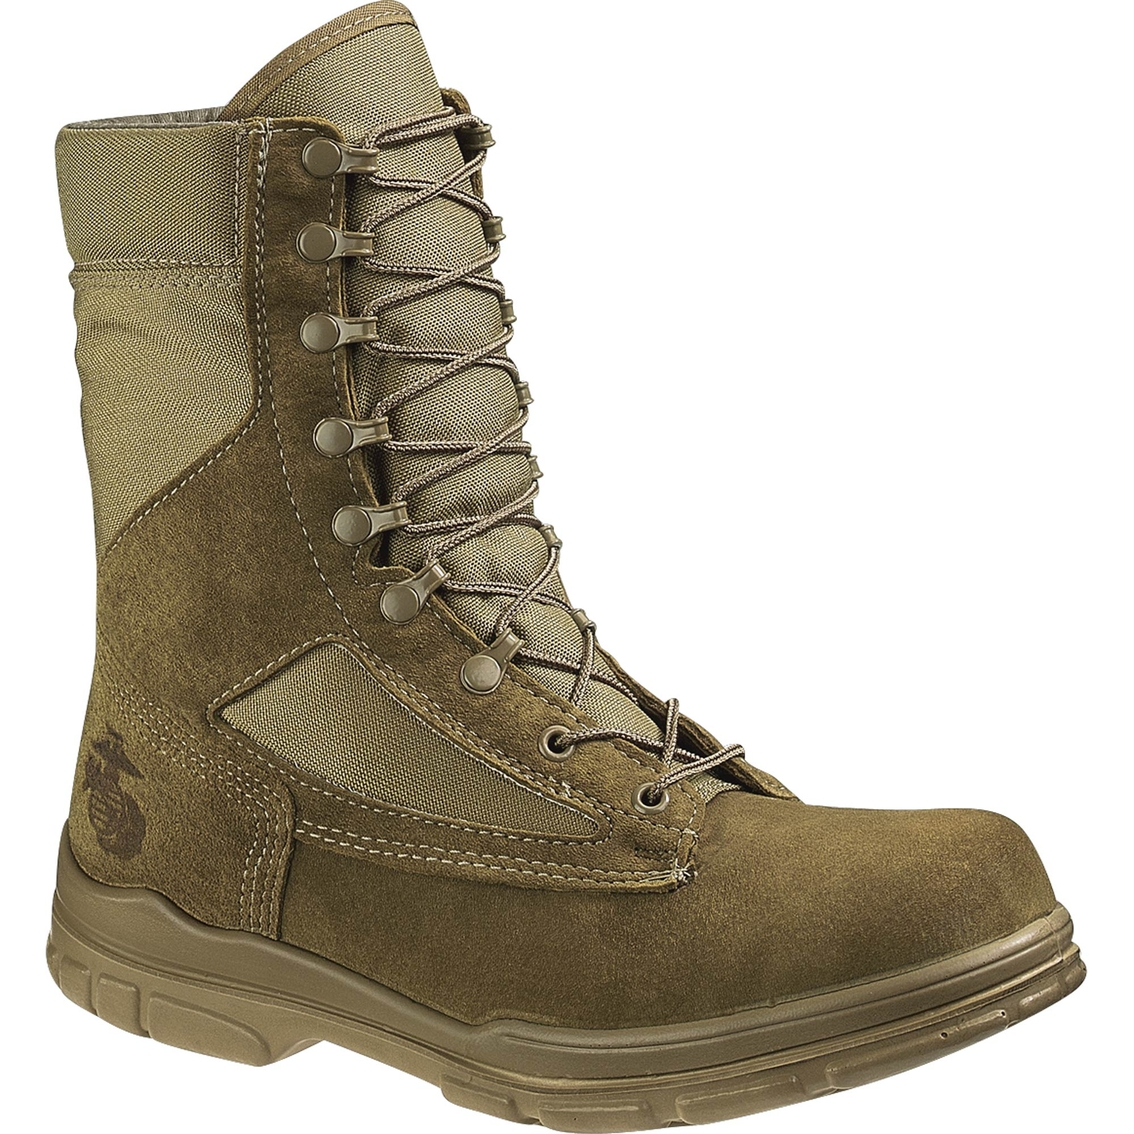 5d178ee180e Bates Lites Men's Usmc Boots | Marine Corps Footwear | Military ...